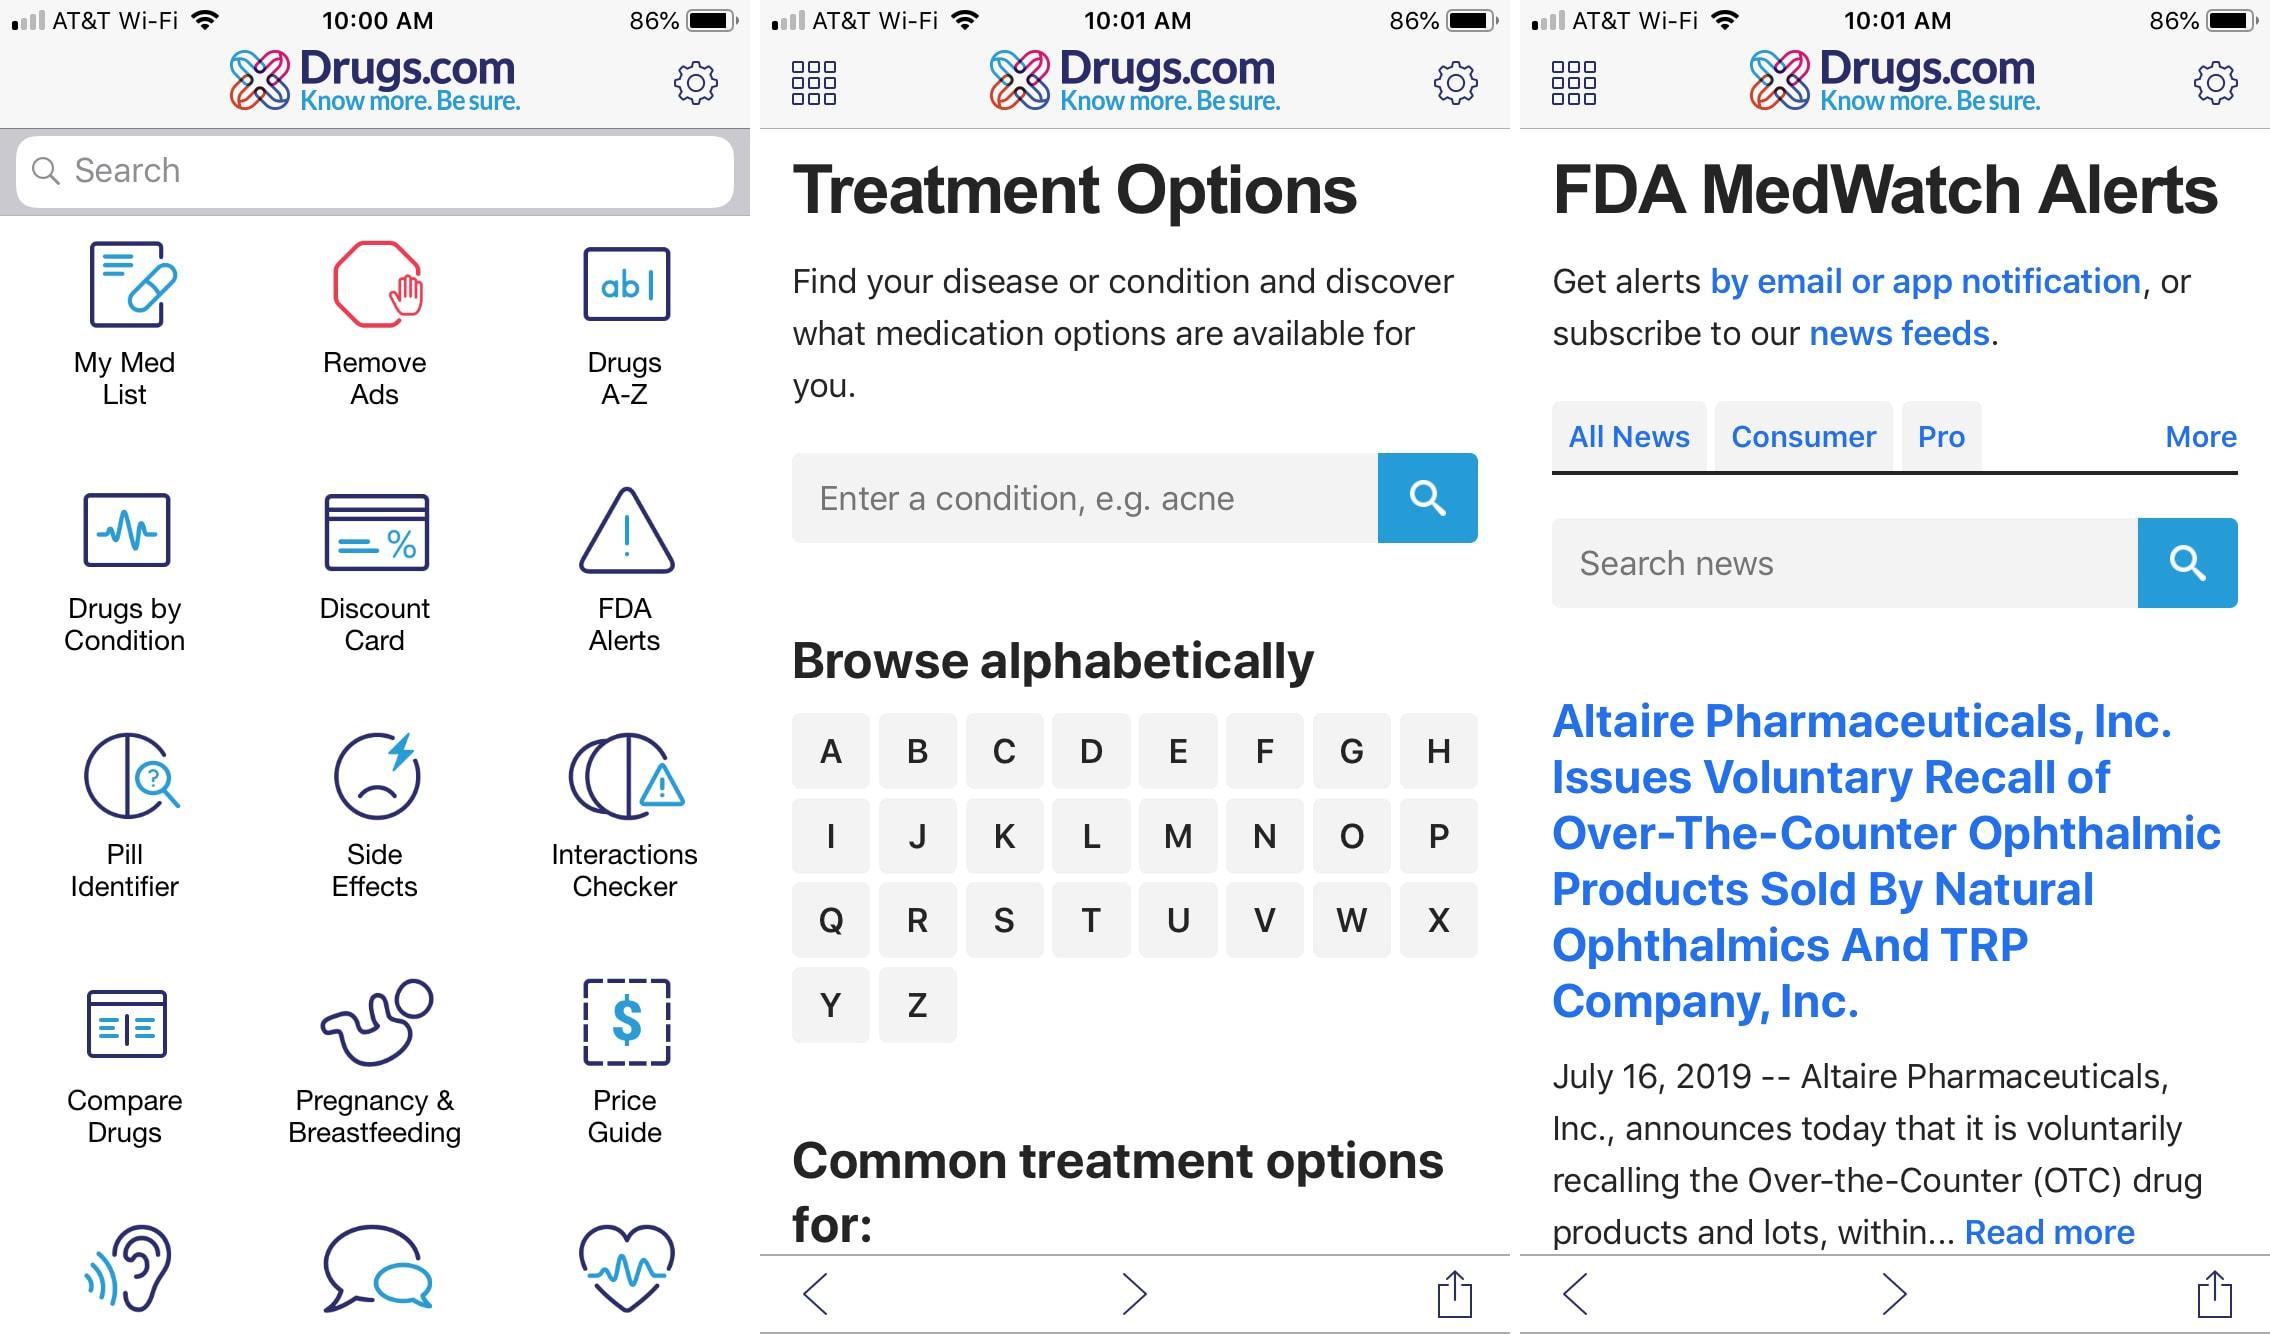 The iPhone DrugsDotCom application